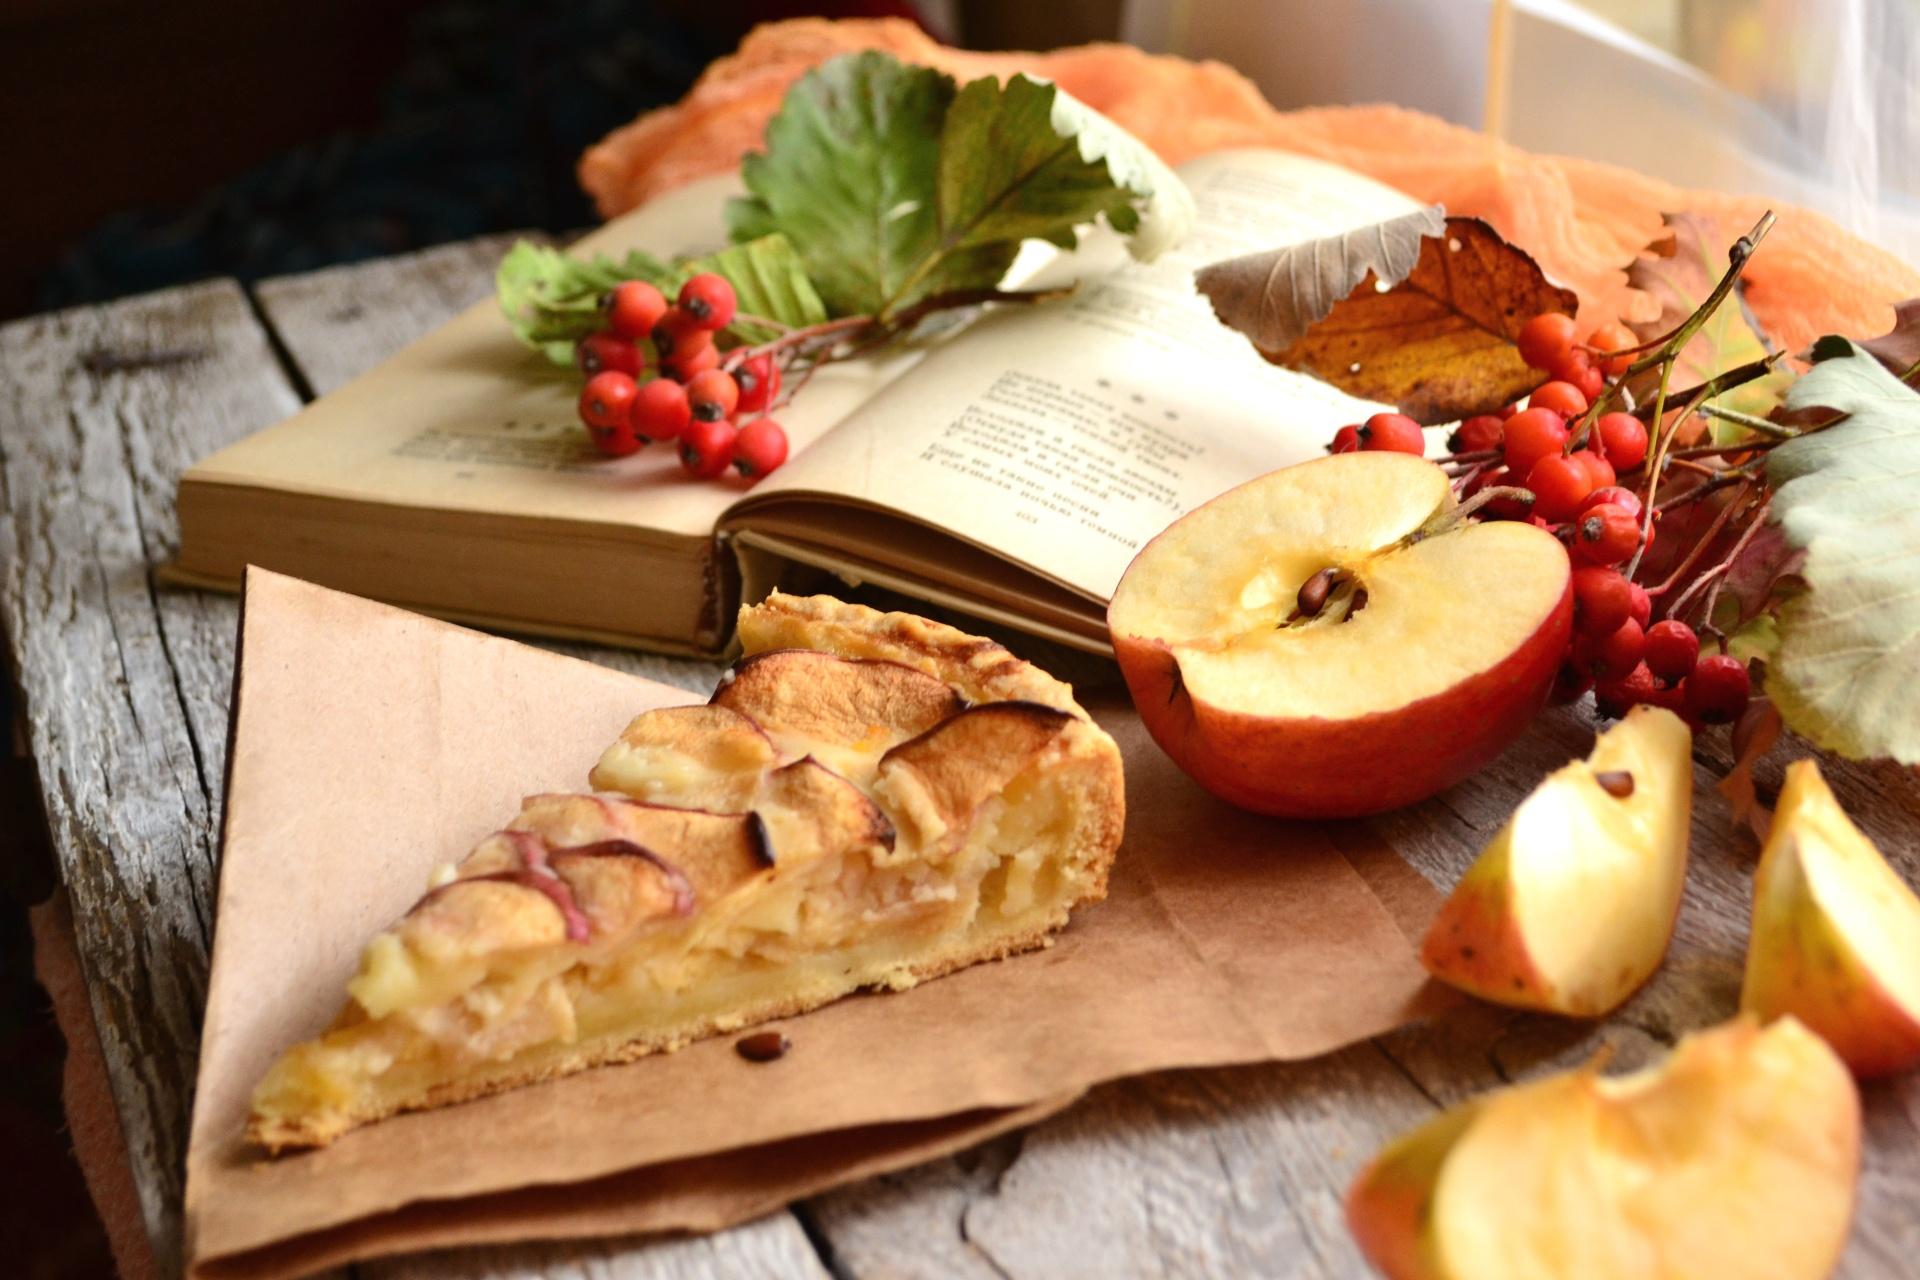 Яблочный пирог обои на рабочий стол